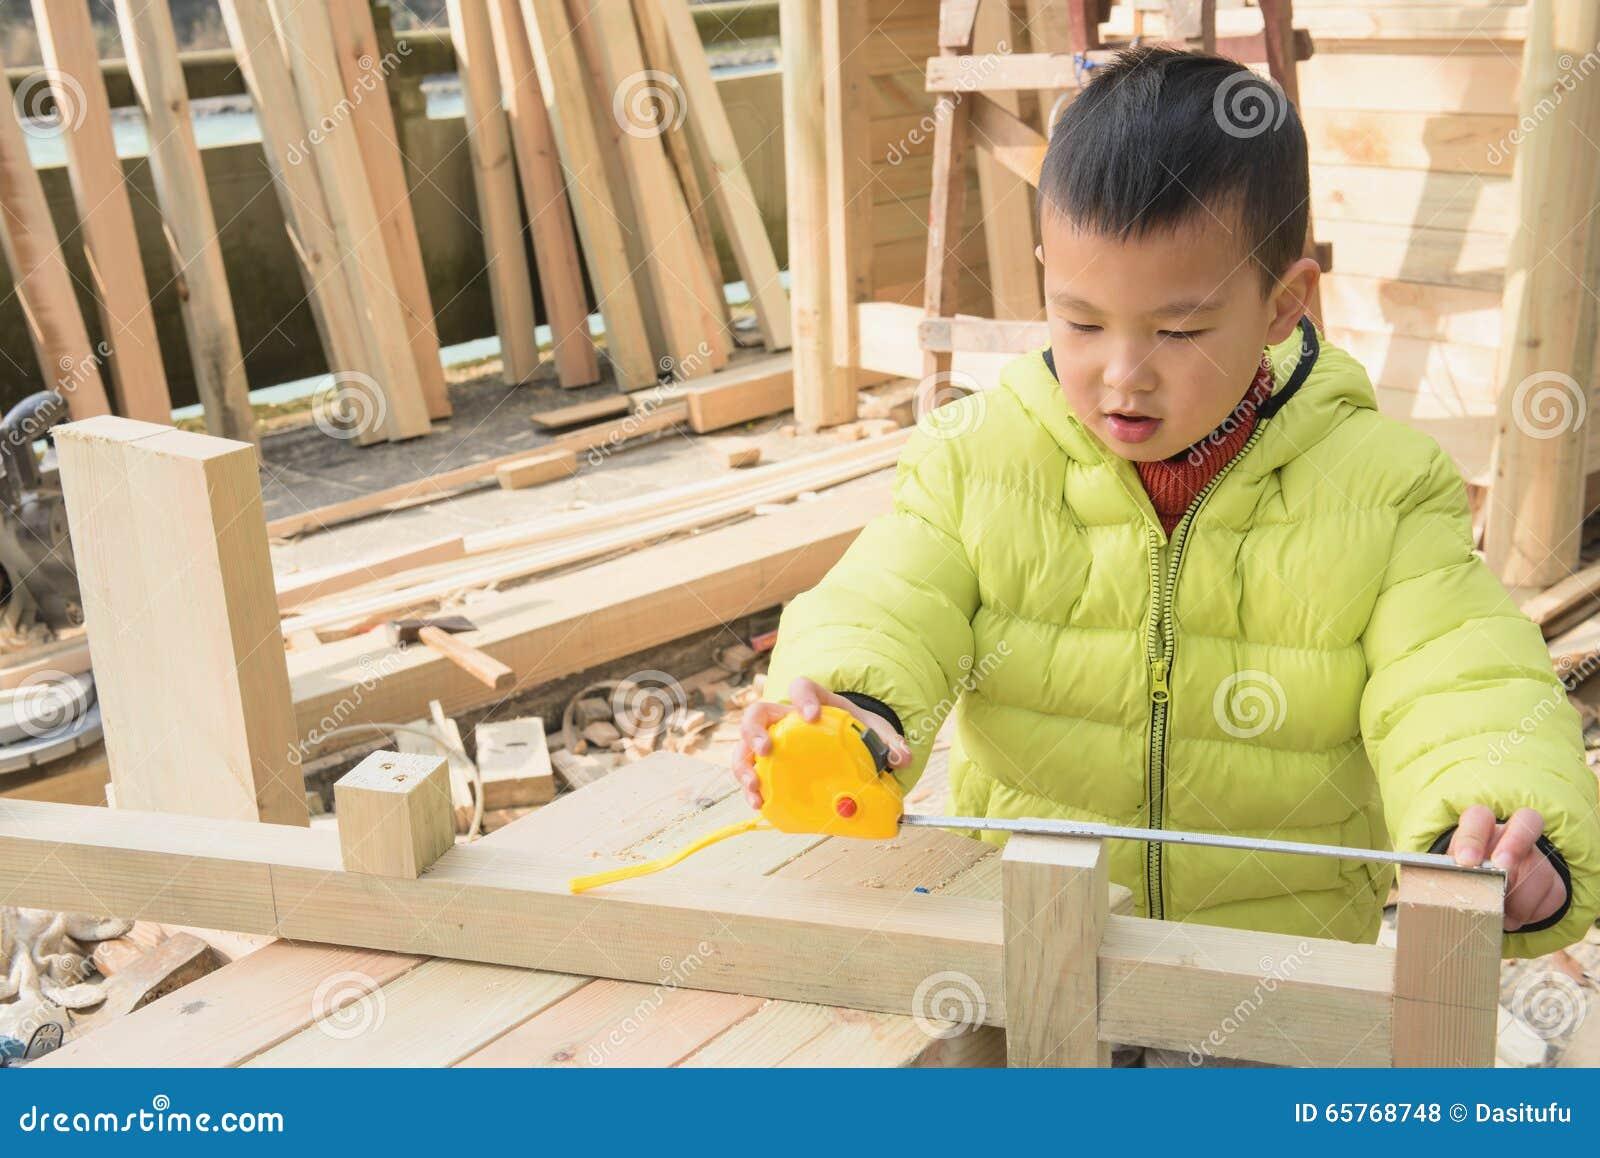 Carpinteiro pequeno